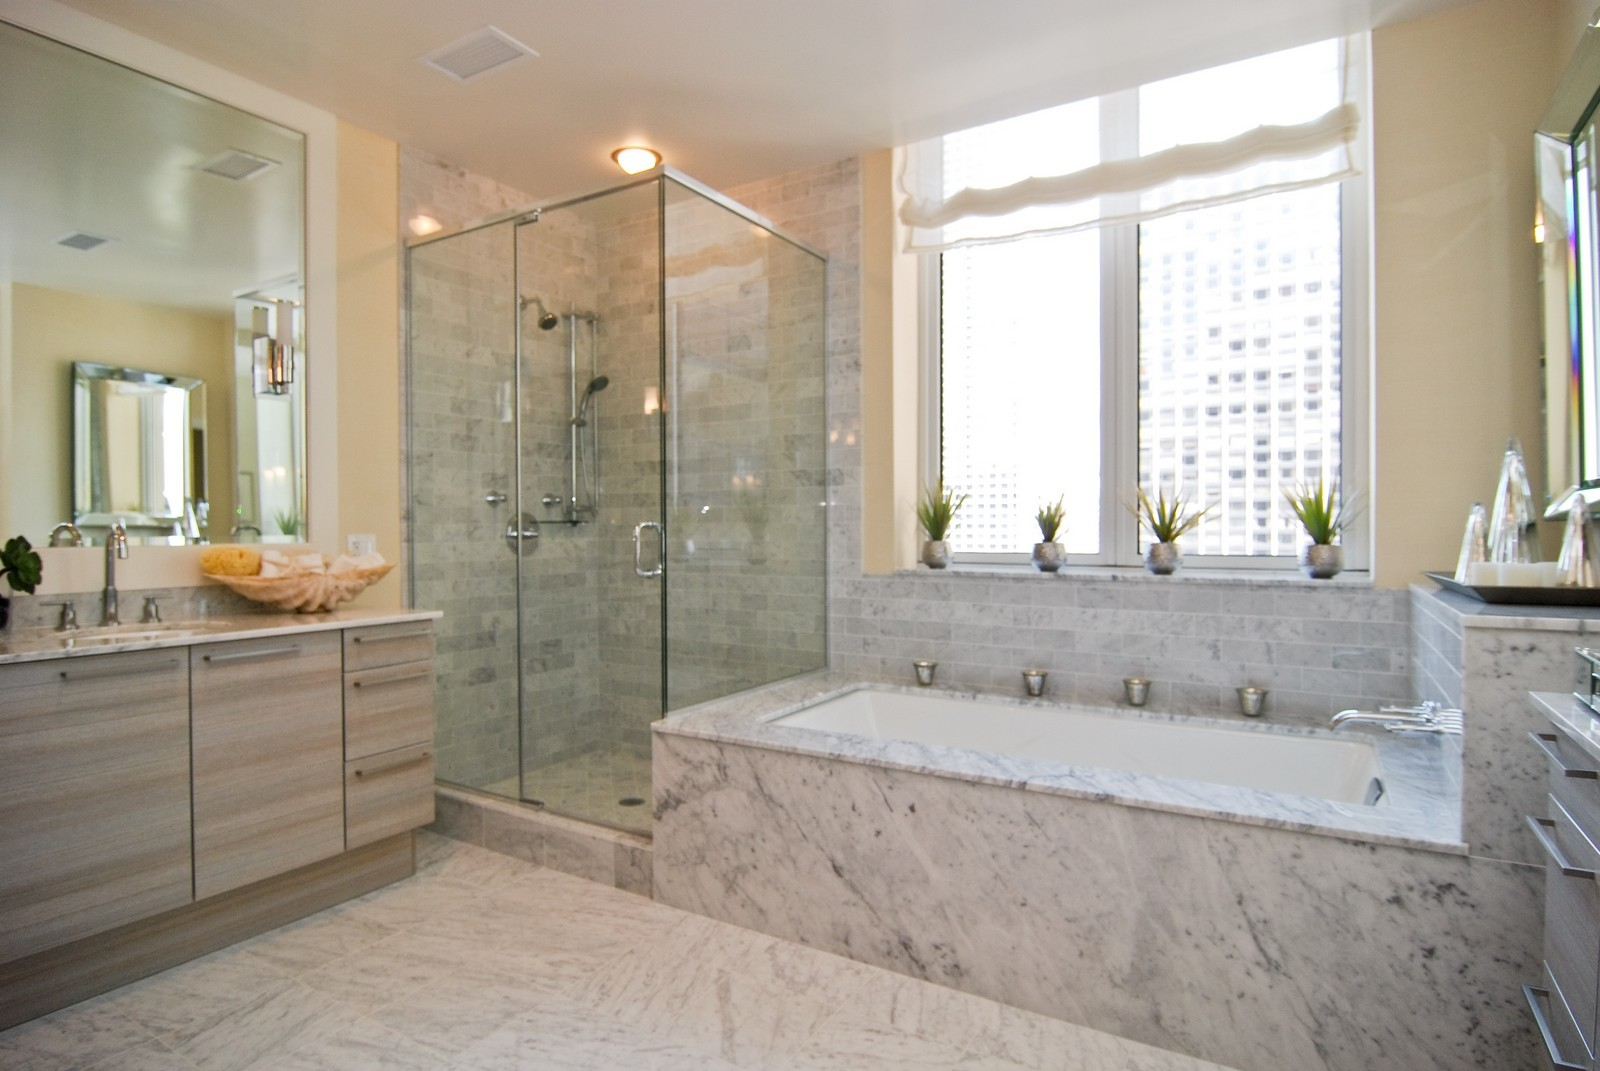 Real Estate Photography - 10 E Delaware Ave, Chicago, IL, 60610 - Master Bathroom